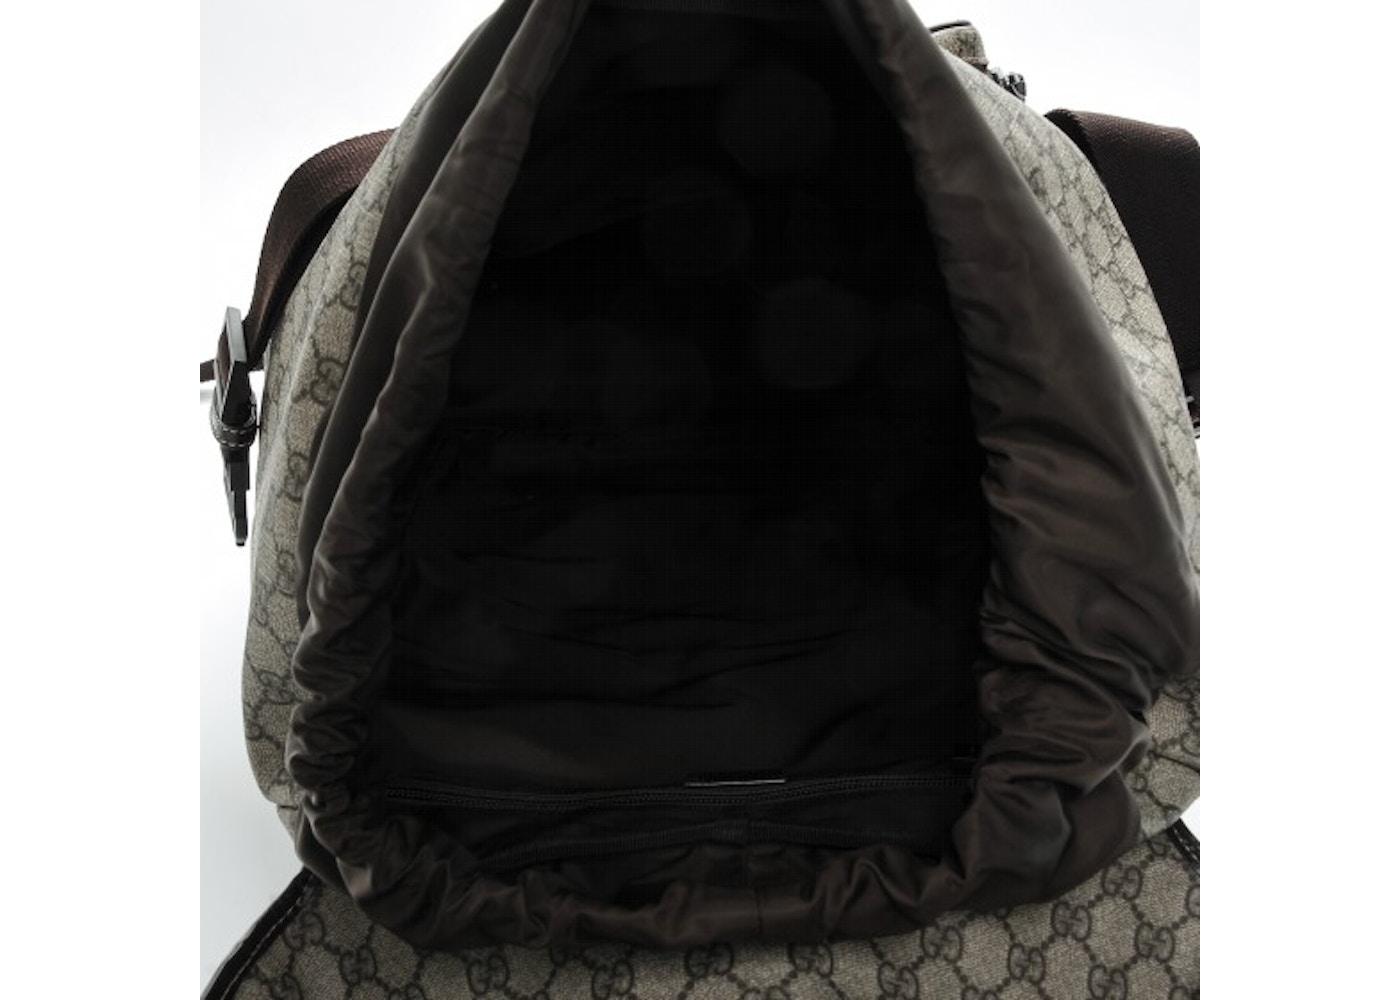 66a87ae139 Gg Supreme Canvas Interlocking G Backpack Black- Fenix Toulouse Handball